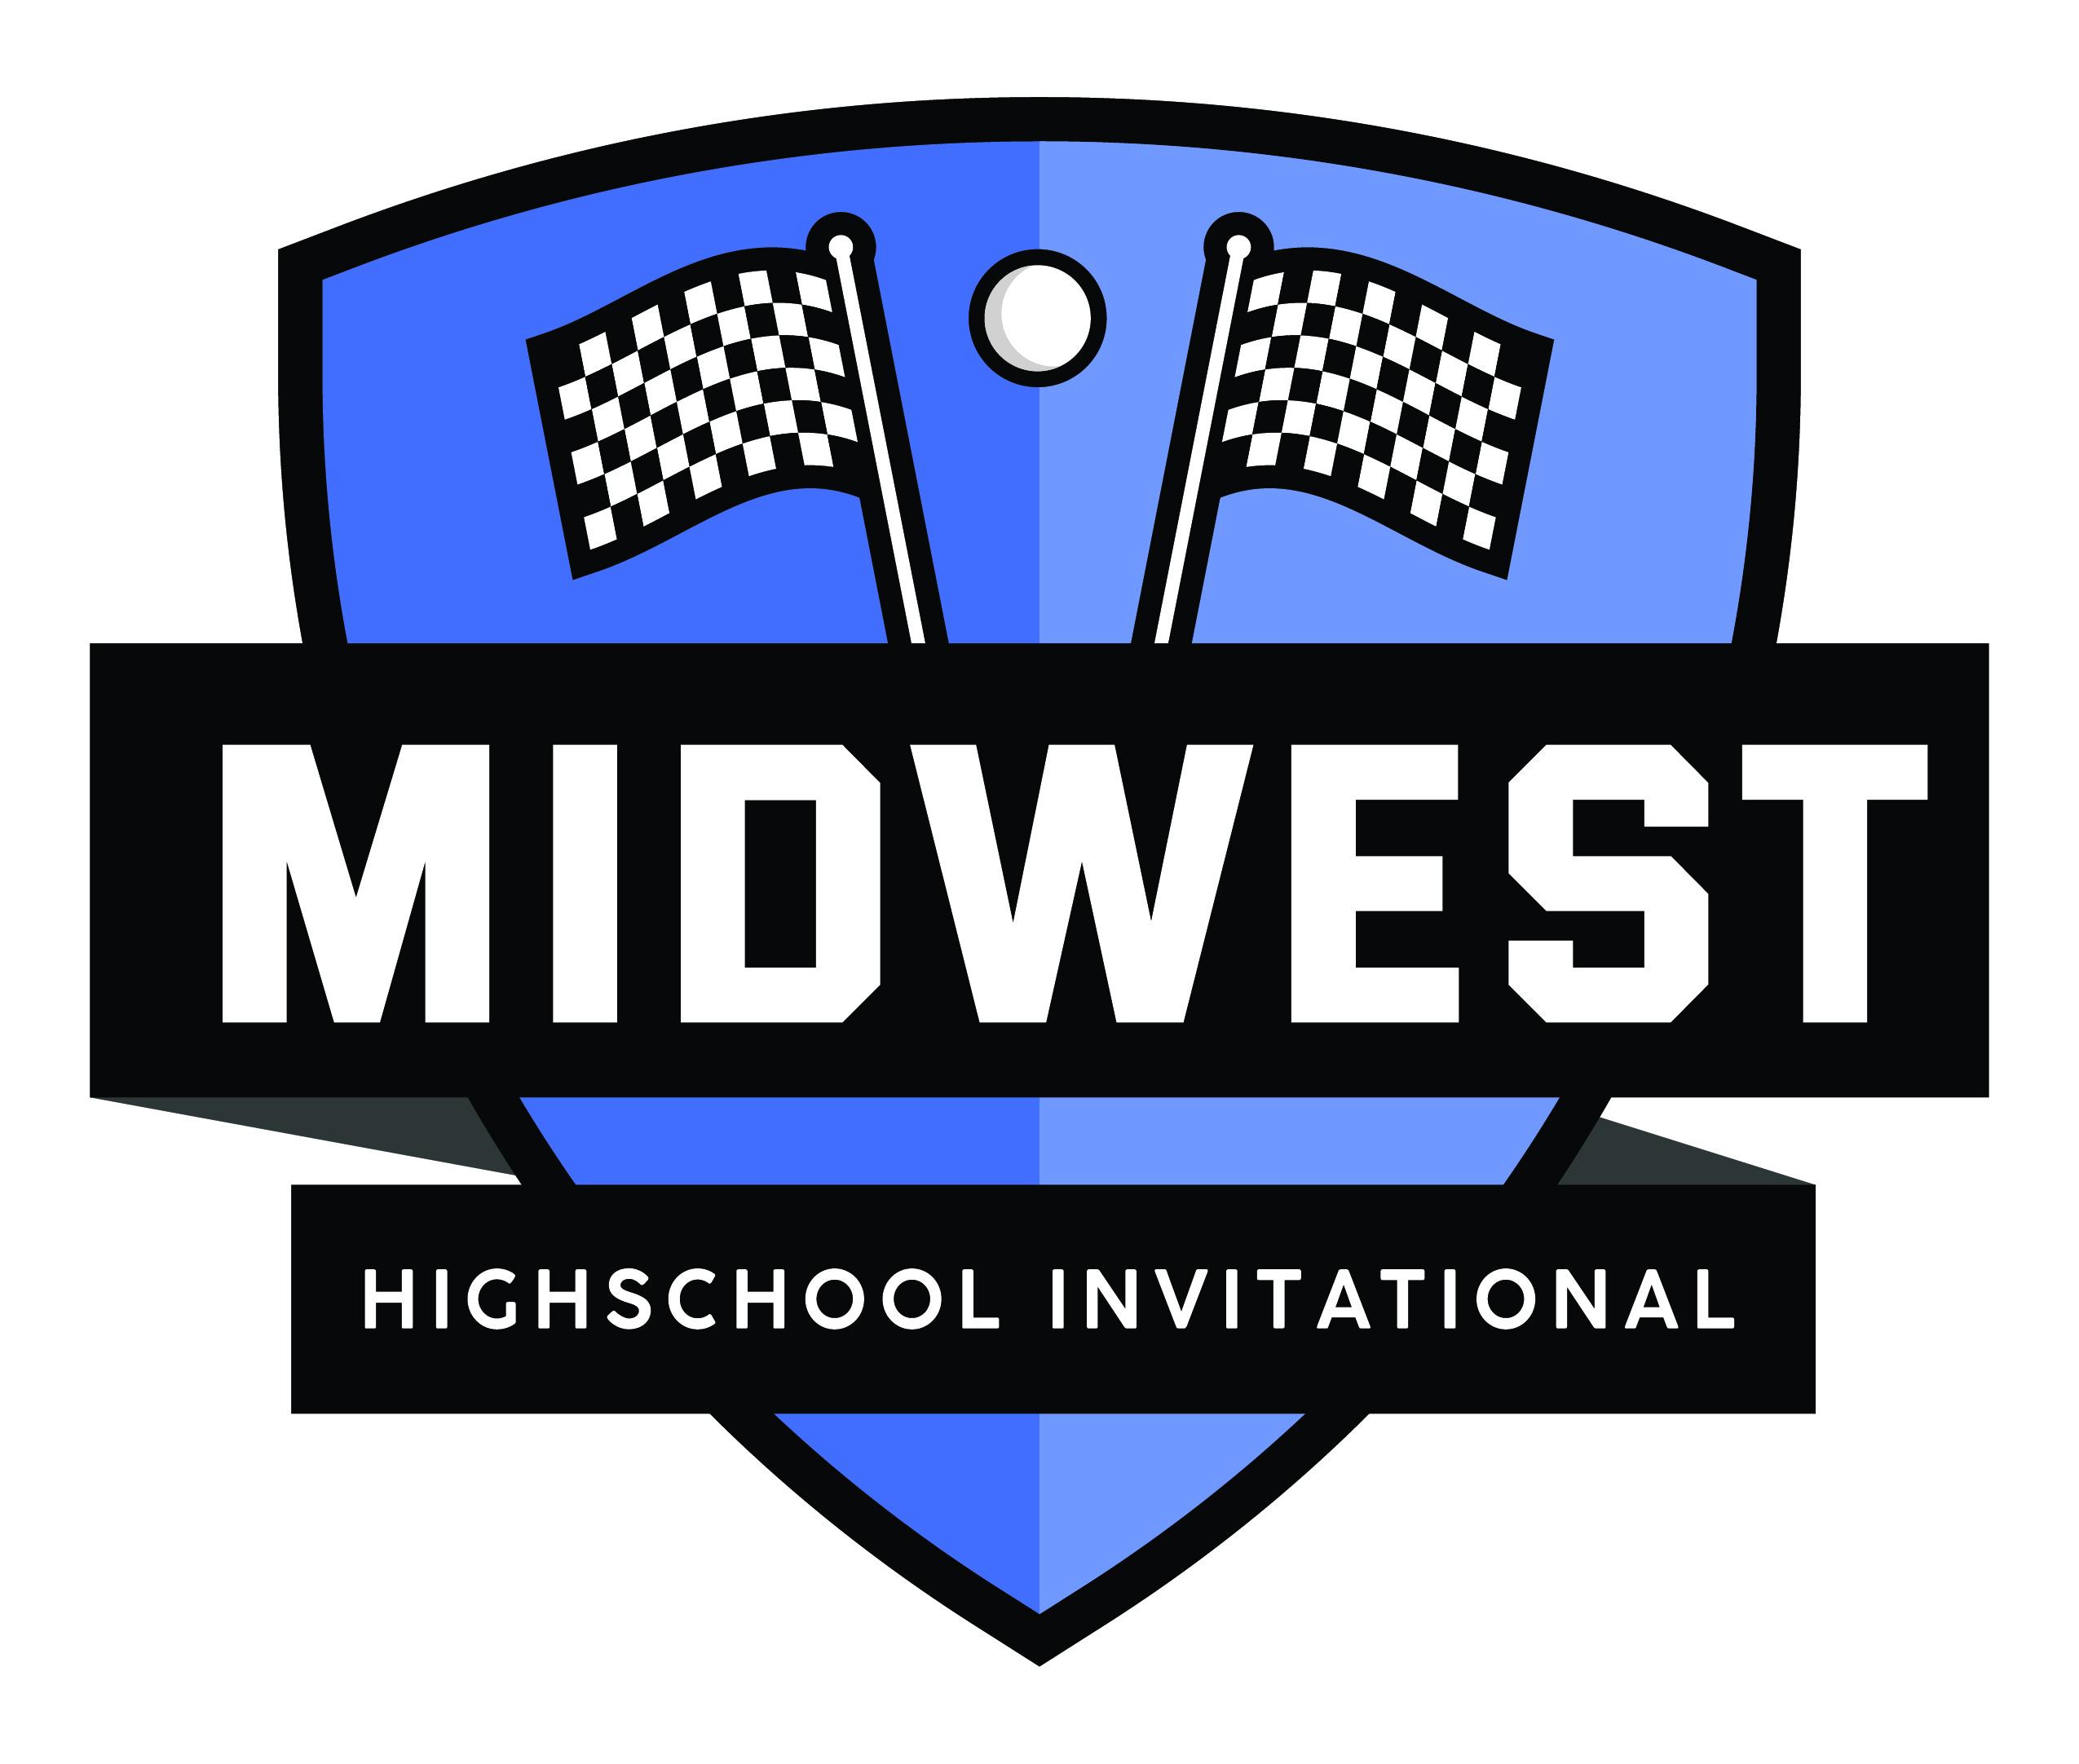 Midwest_Highschool_Invitational_FINAL_A_CMYK